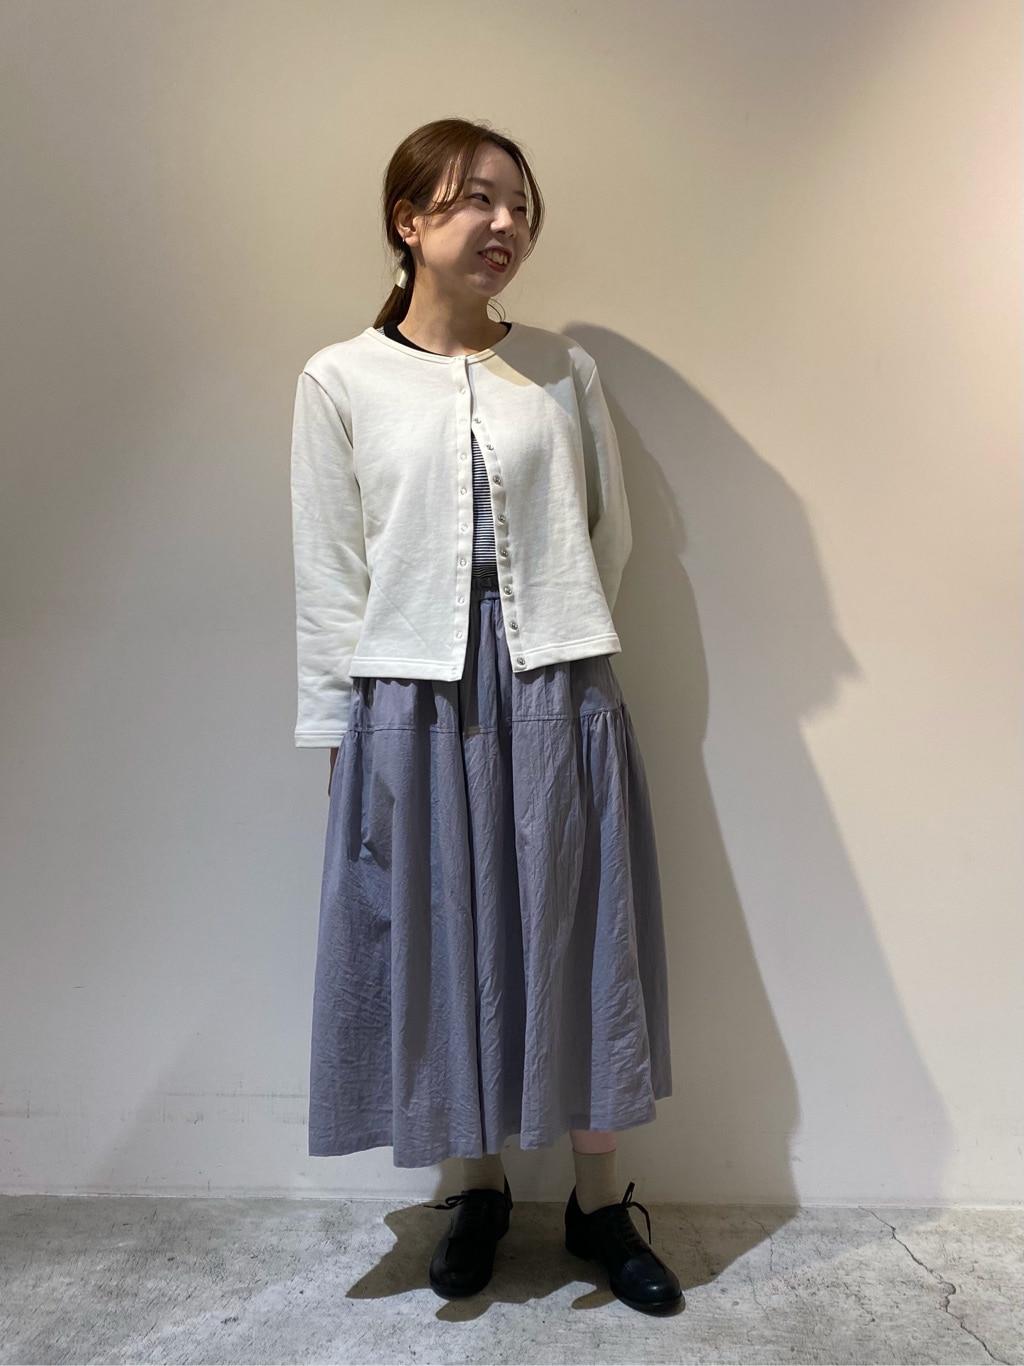 chambre de charme 京都路面 身長:155cm 2021.03.27